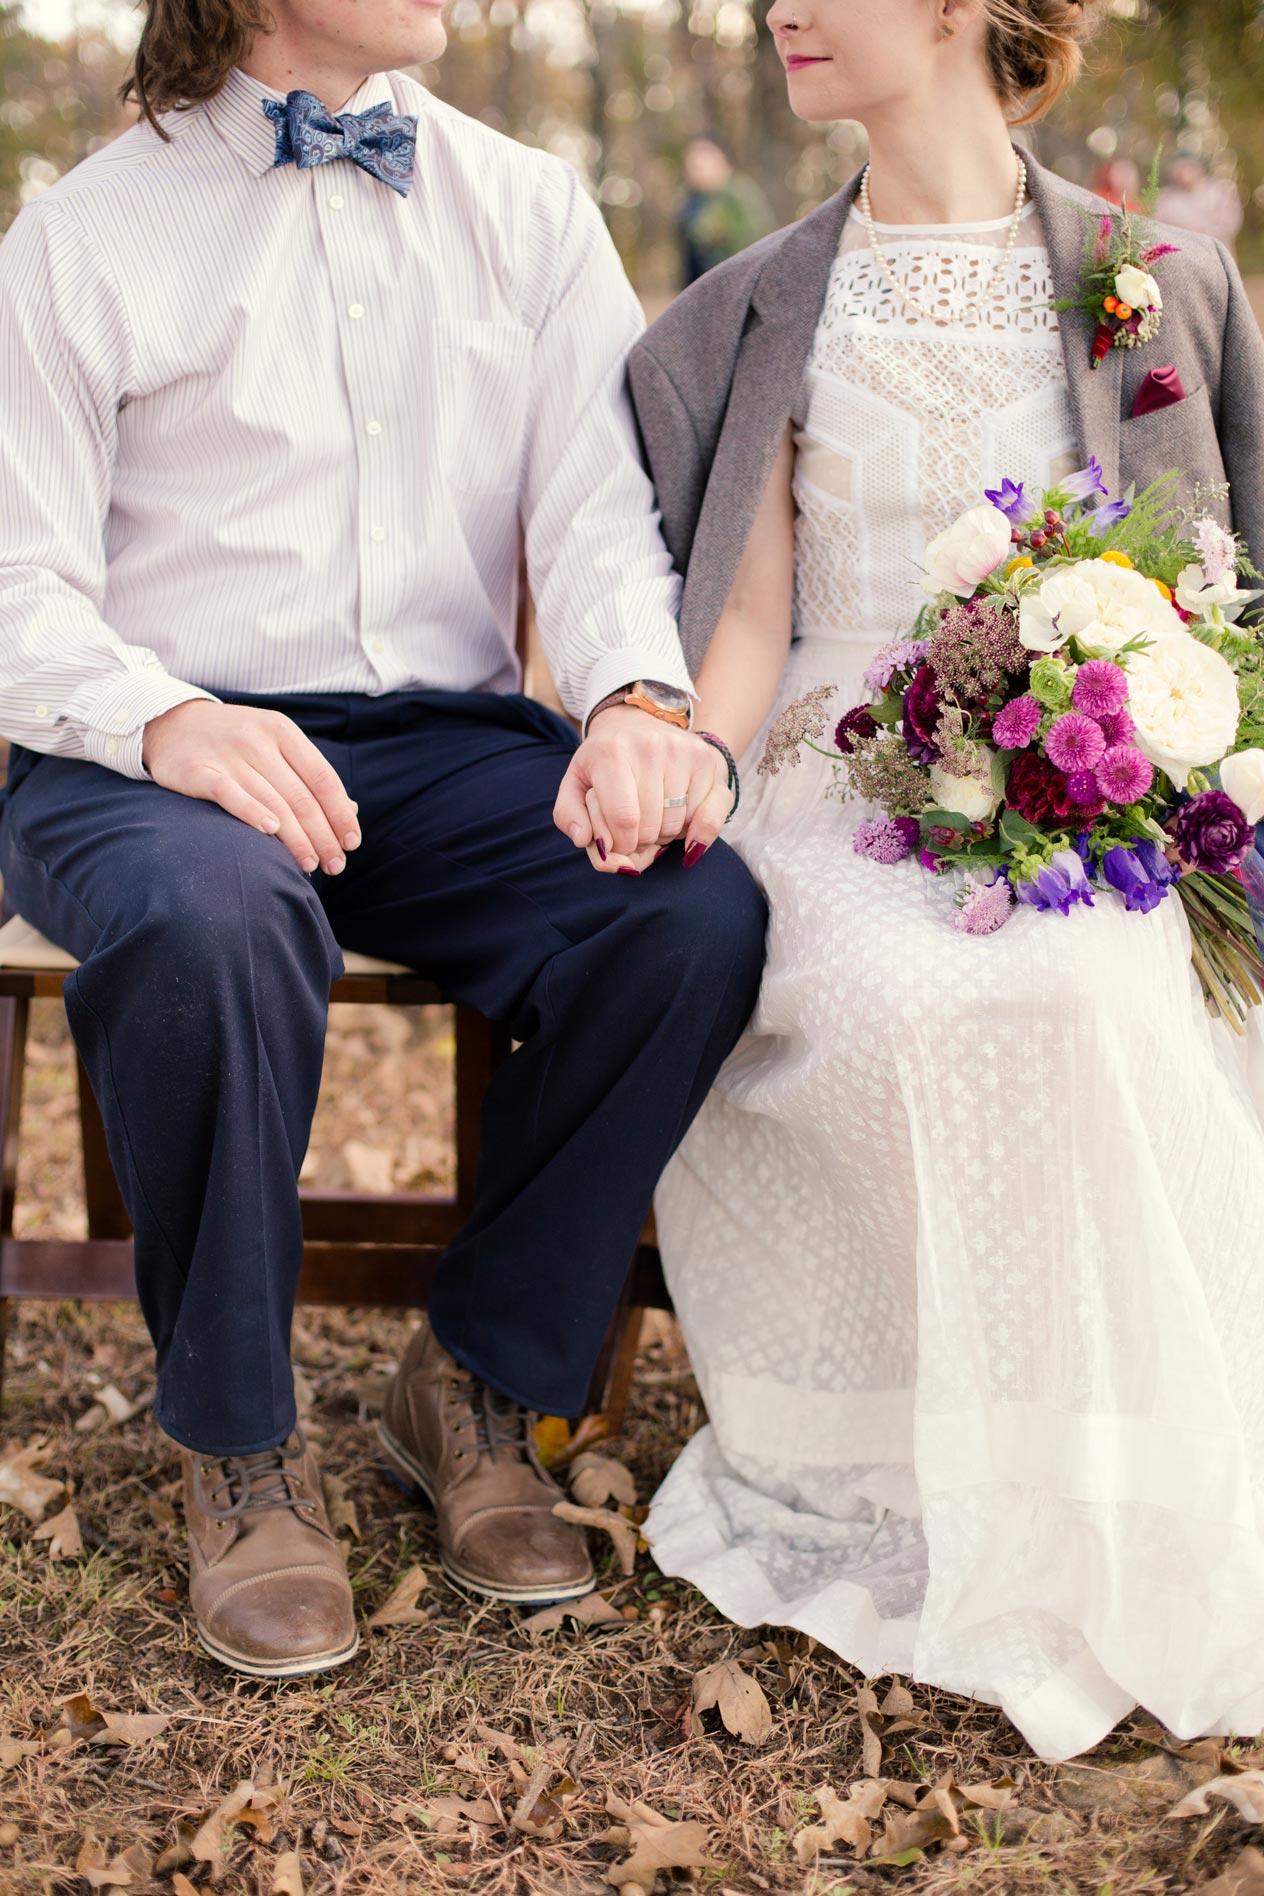 Rustic-Whimsical-Wedding- Tulsa-Wedding-FloristRobyns-Flower-Garden_Mallory-Hall-Photography16.jpg